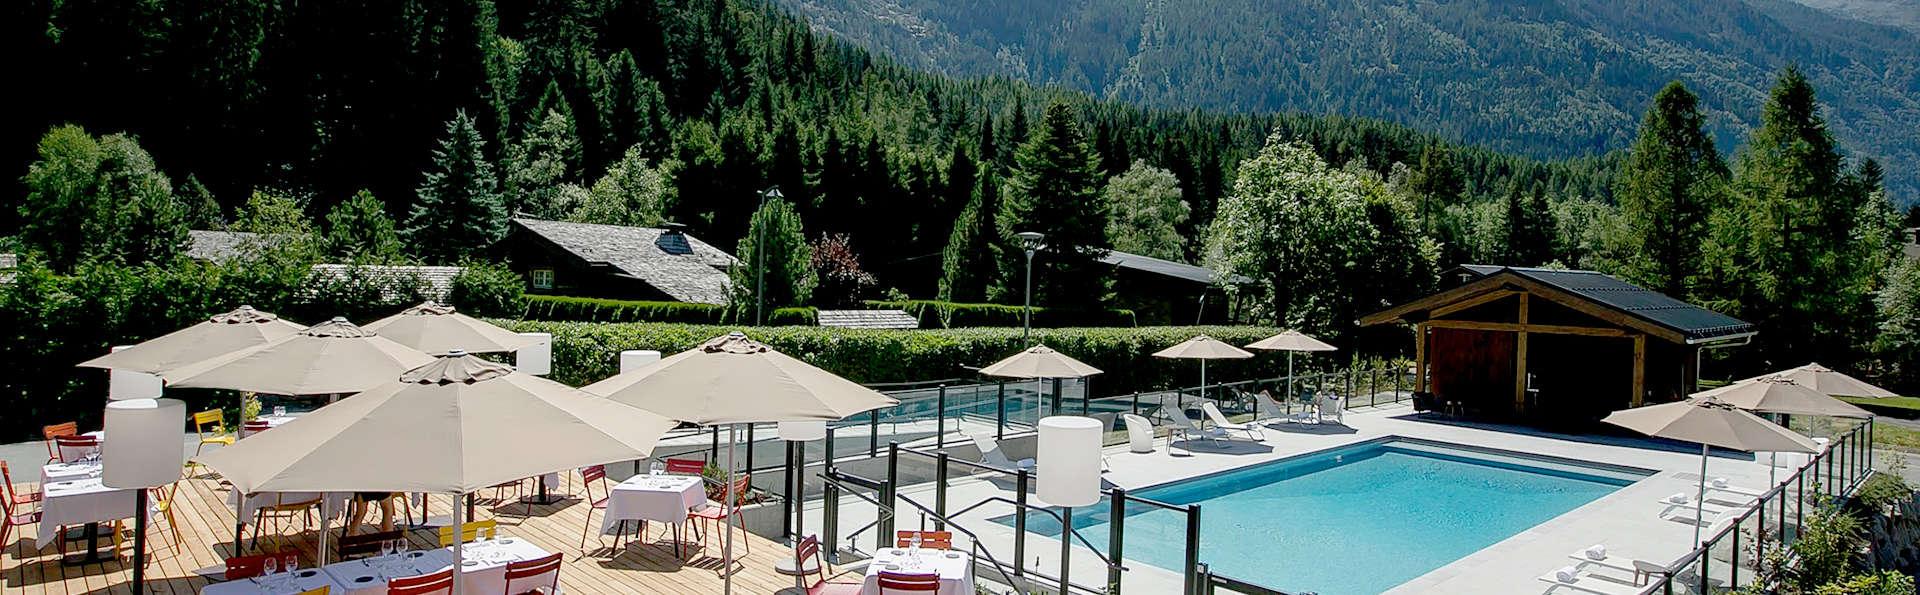 Best Western Plus Excelsior Chamonix Hotel Spa  - Edit_Terrace2.jpg